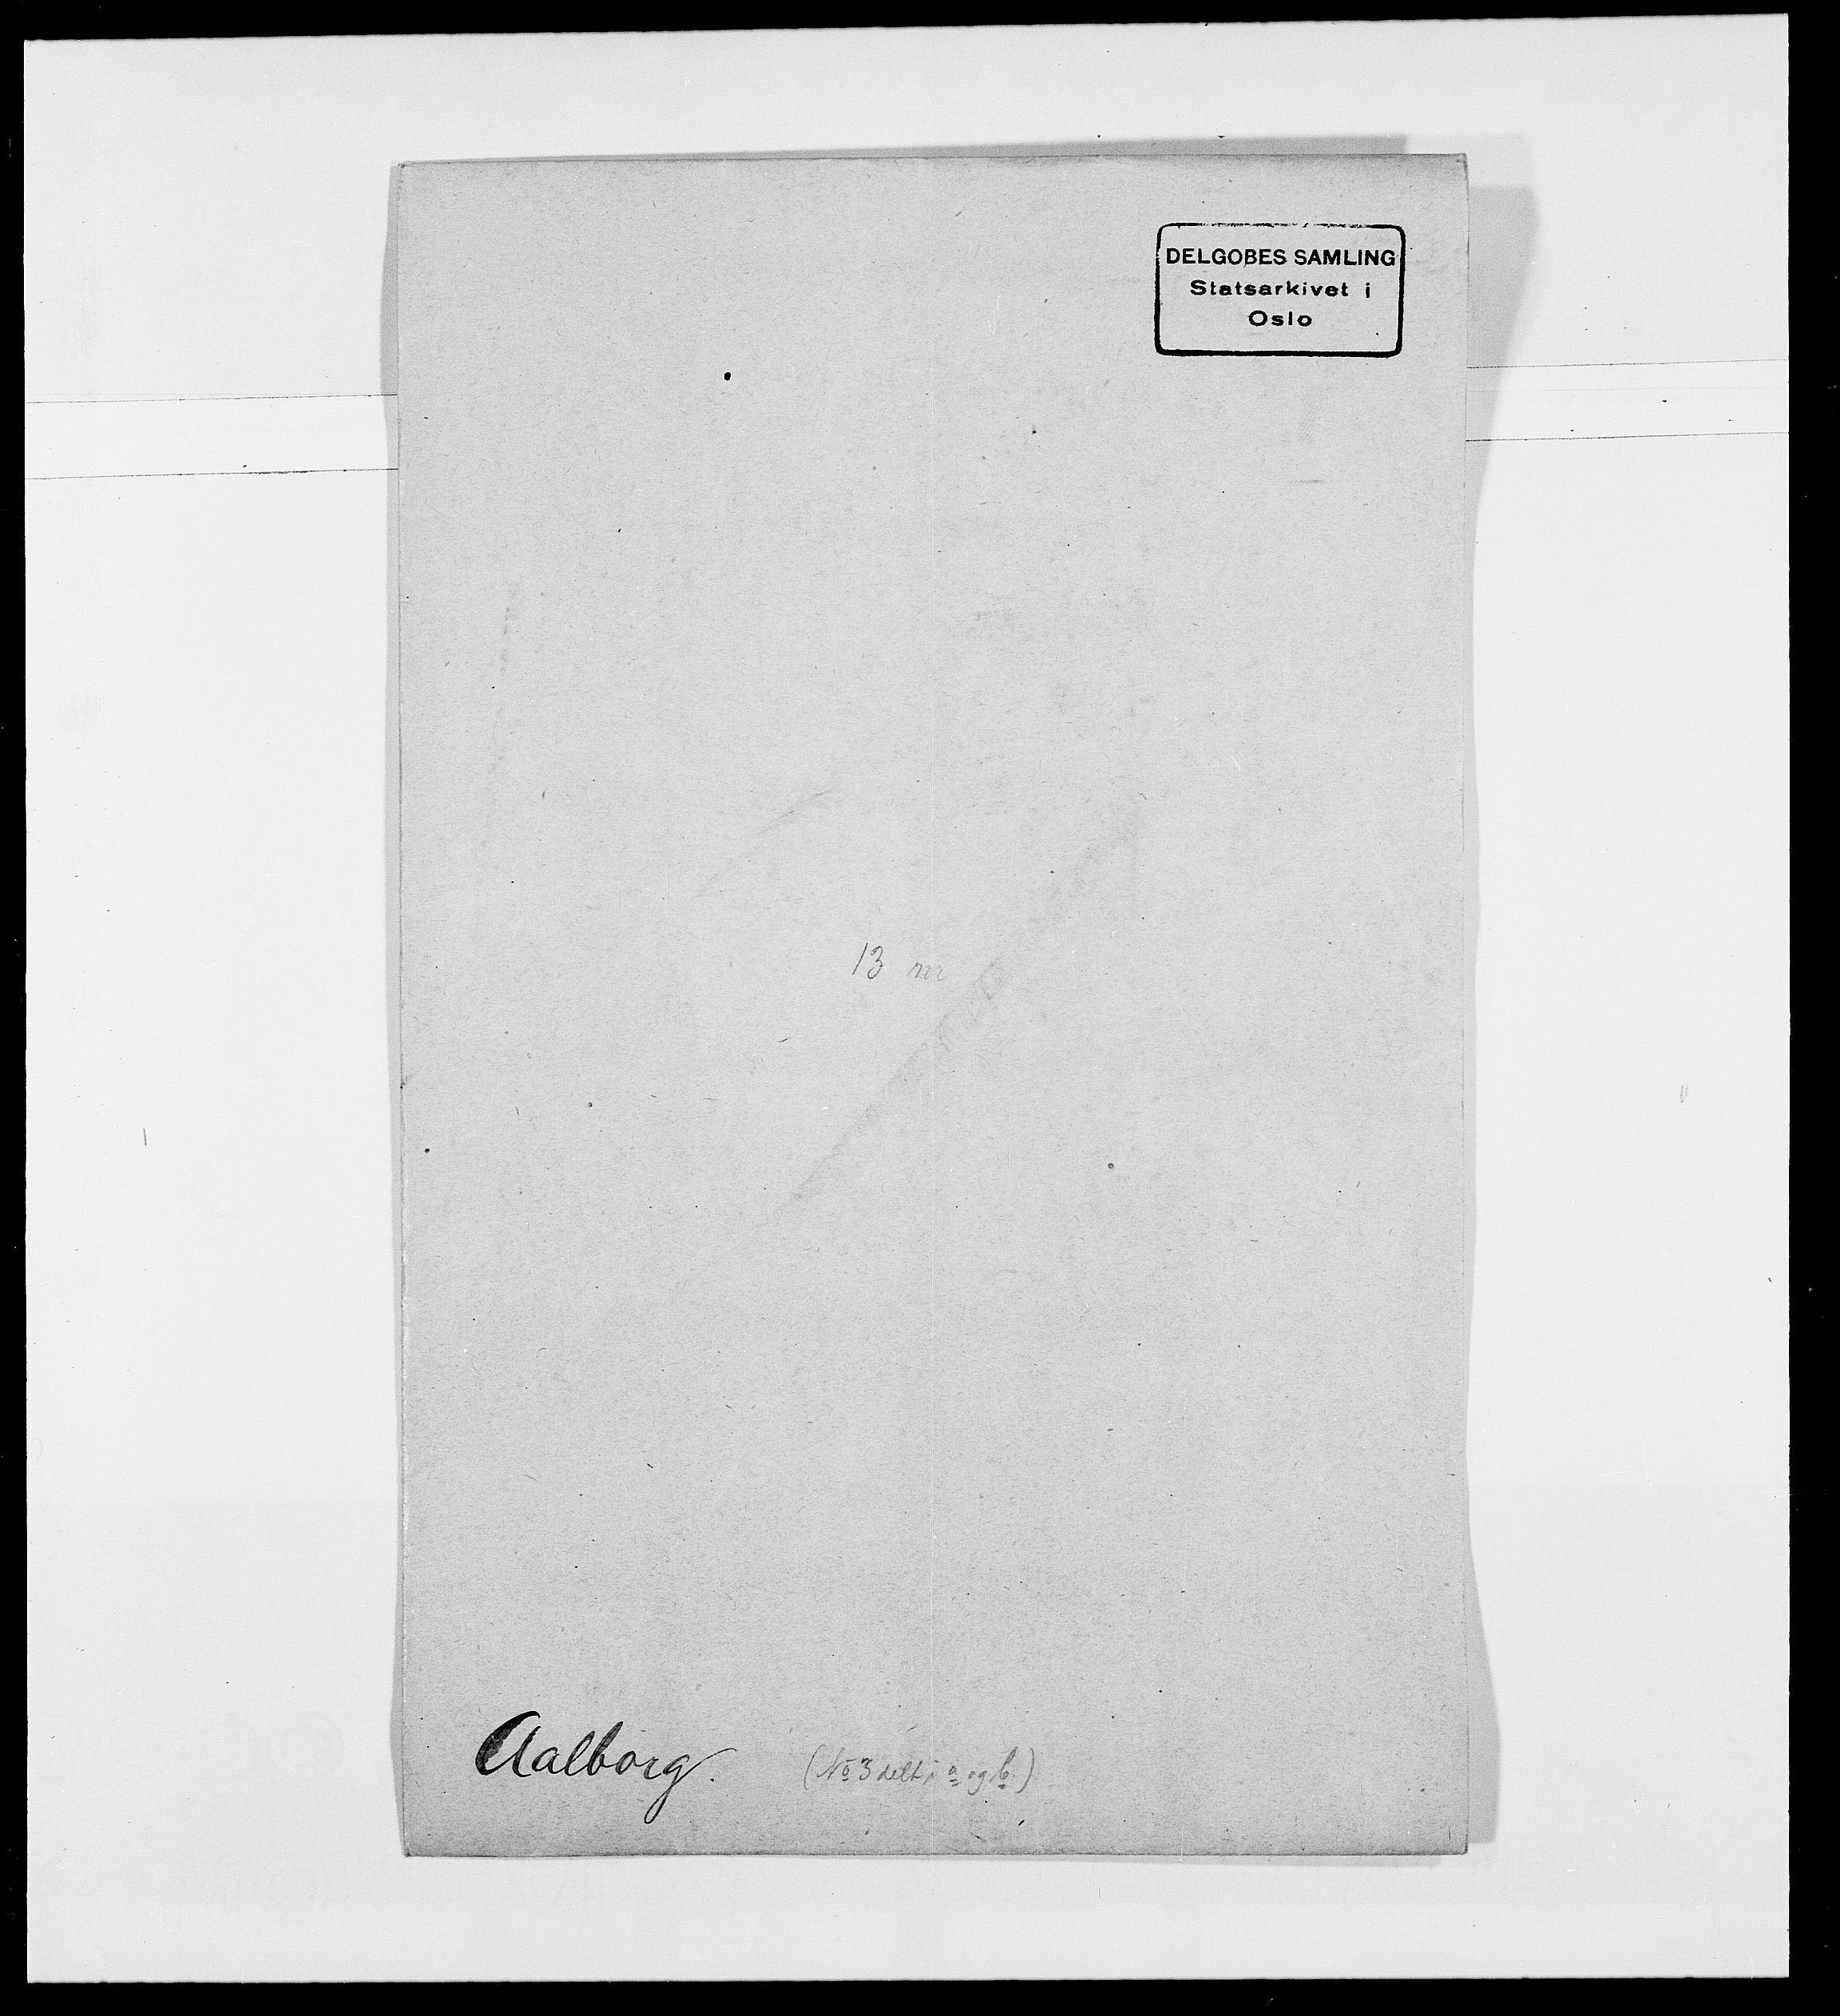 SAO, Delgobe, Charles Antoine - samling, D/Da/L0001: Aabye - Angerman, s. 45